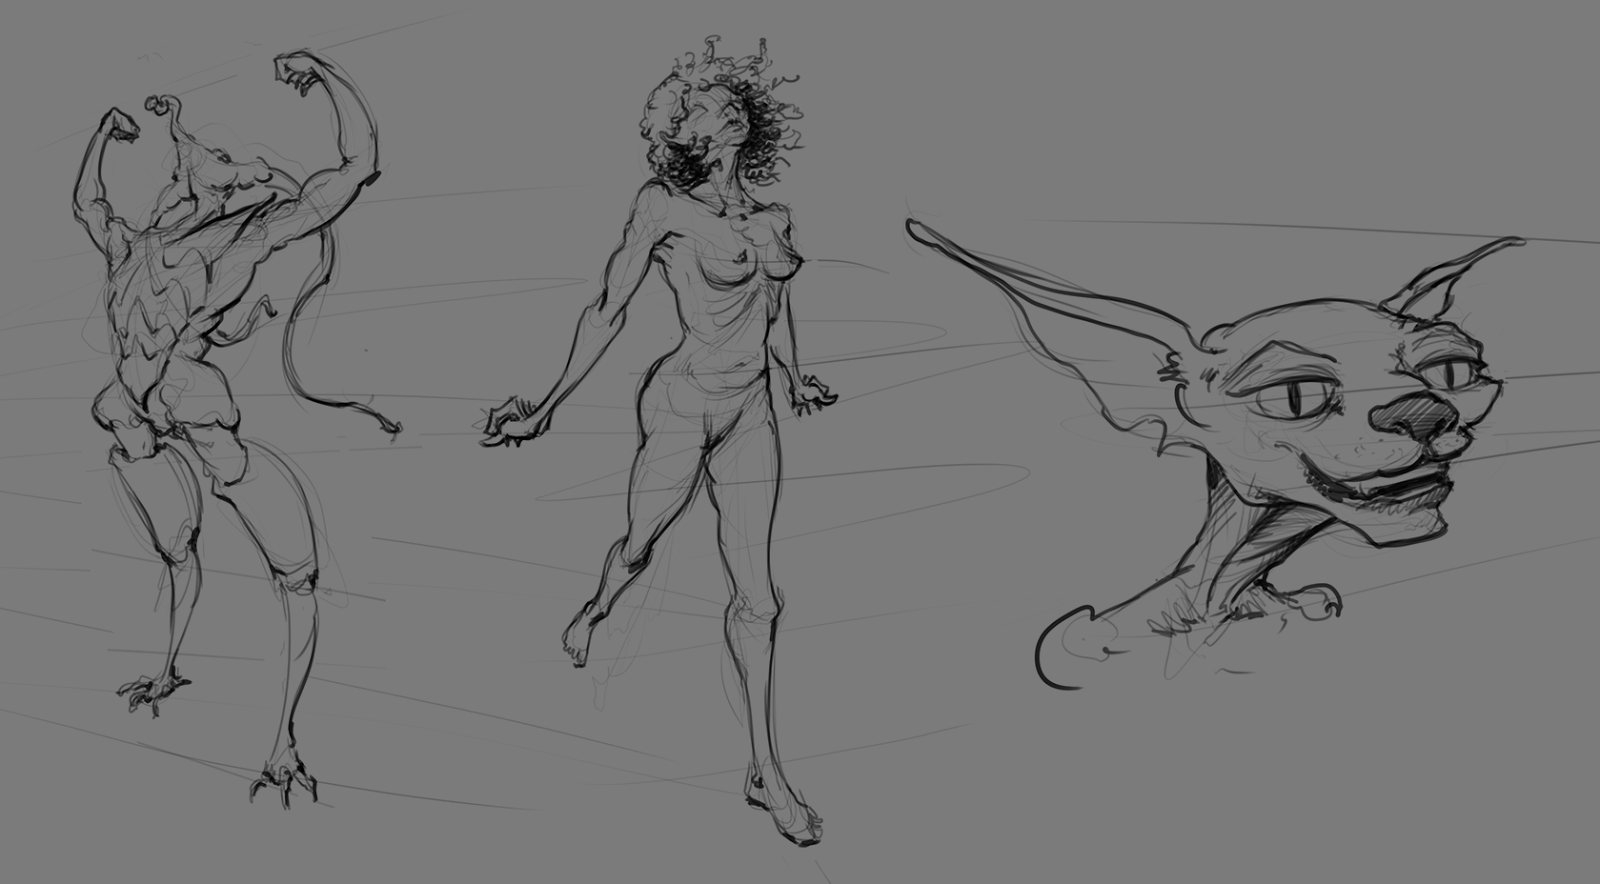 XaB au travail ! [nudity inside] - Page 12 Croquis_2016.10.05